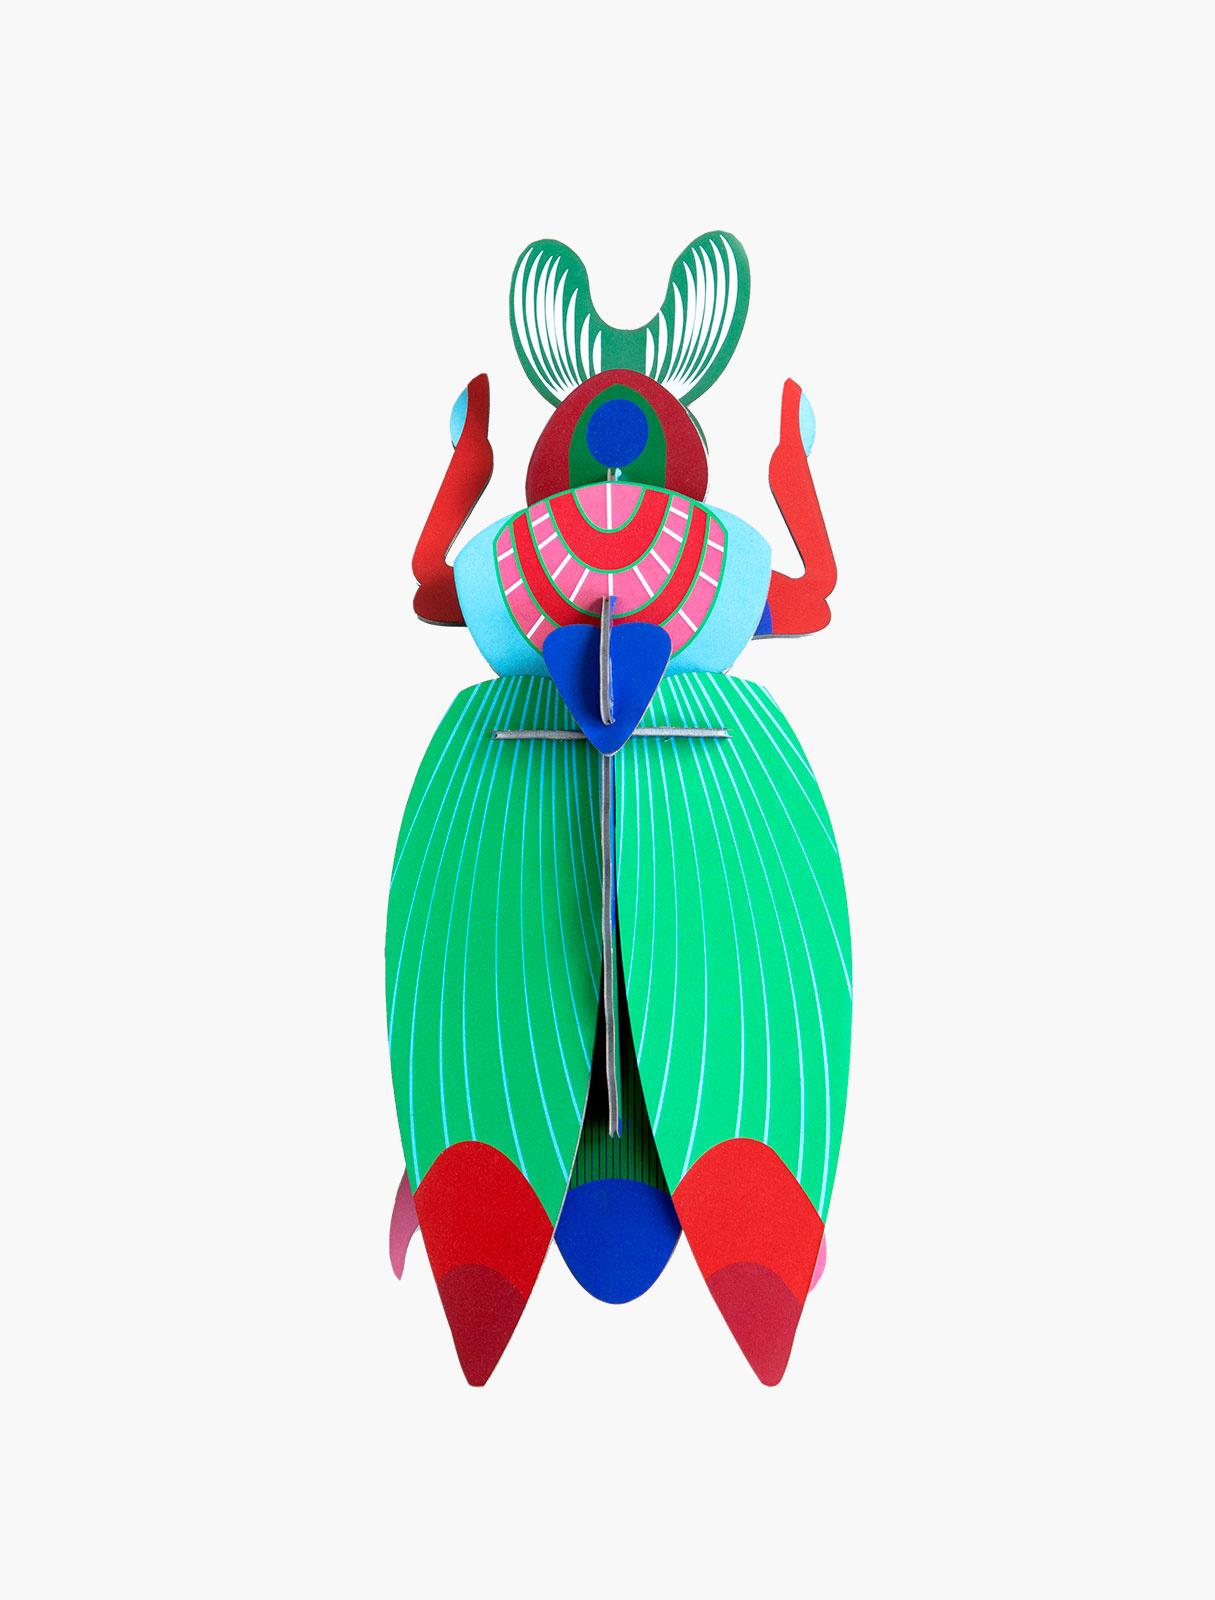 Studio Roof 3D Wanddecoratie Giant Scarab Beetle